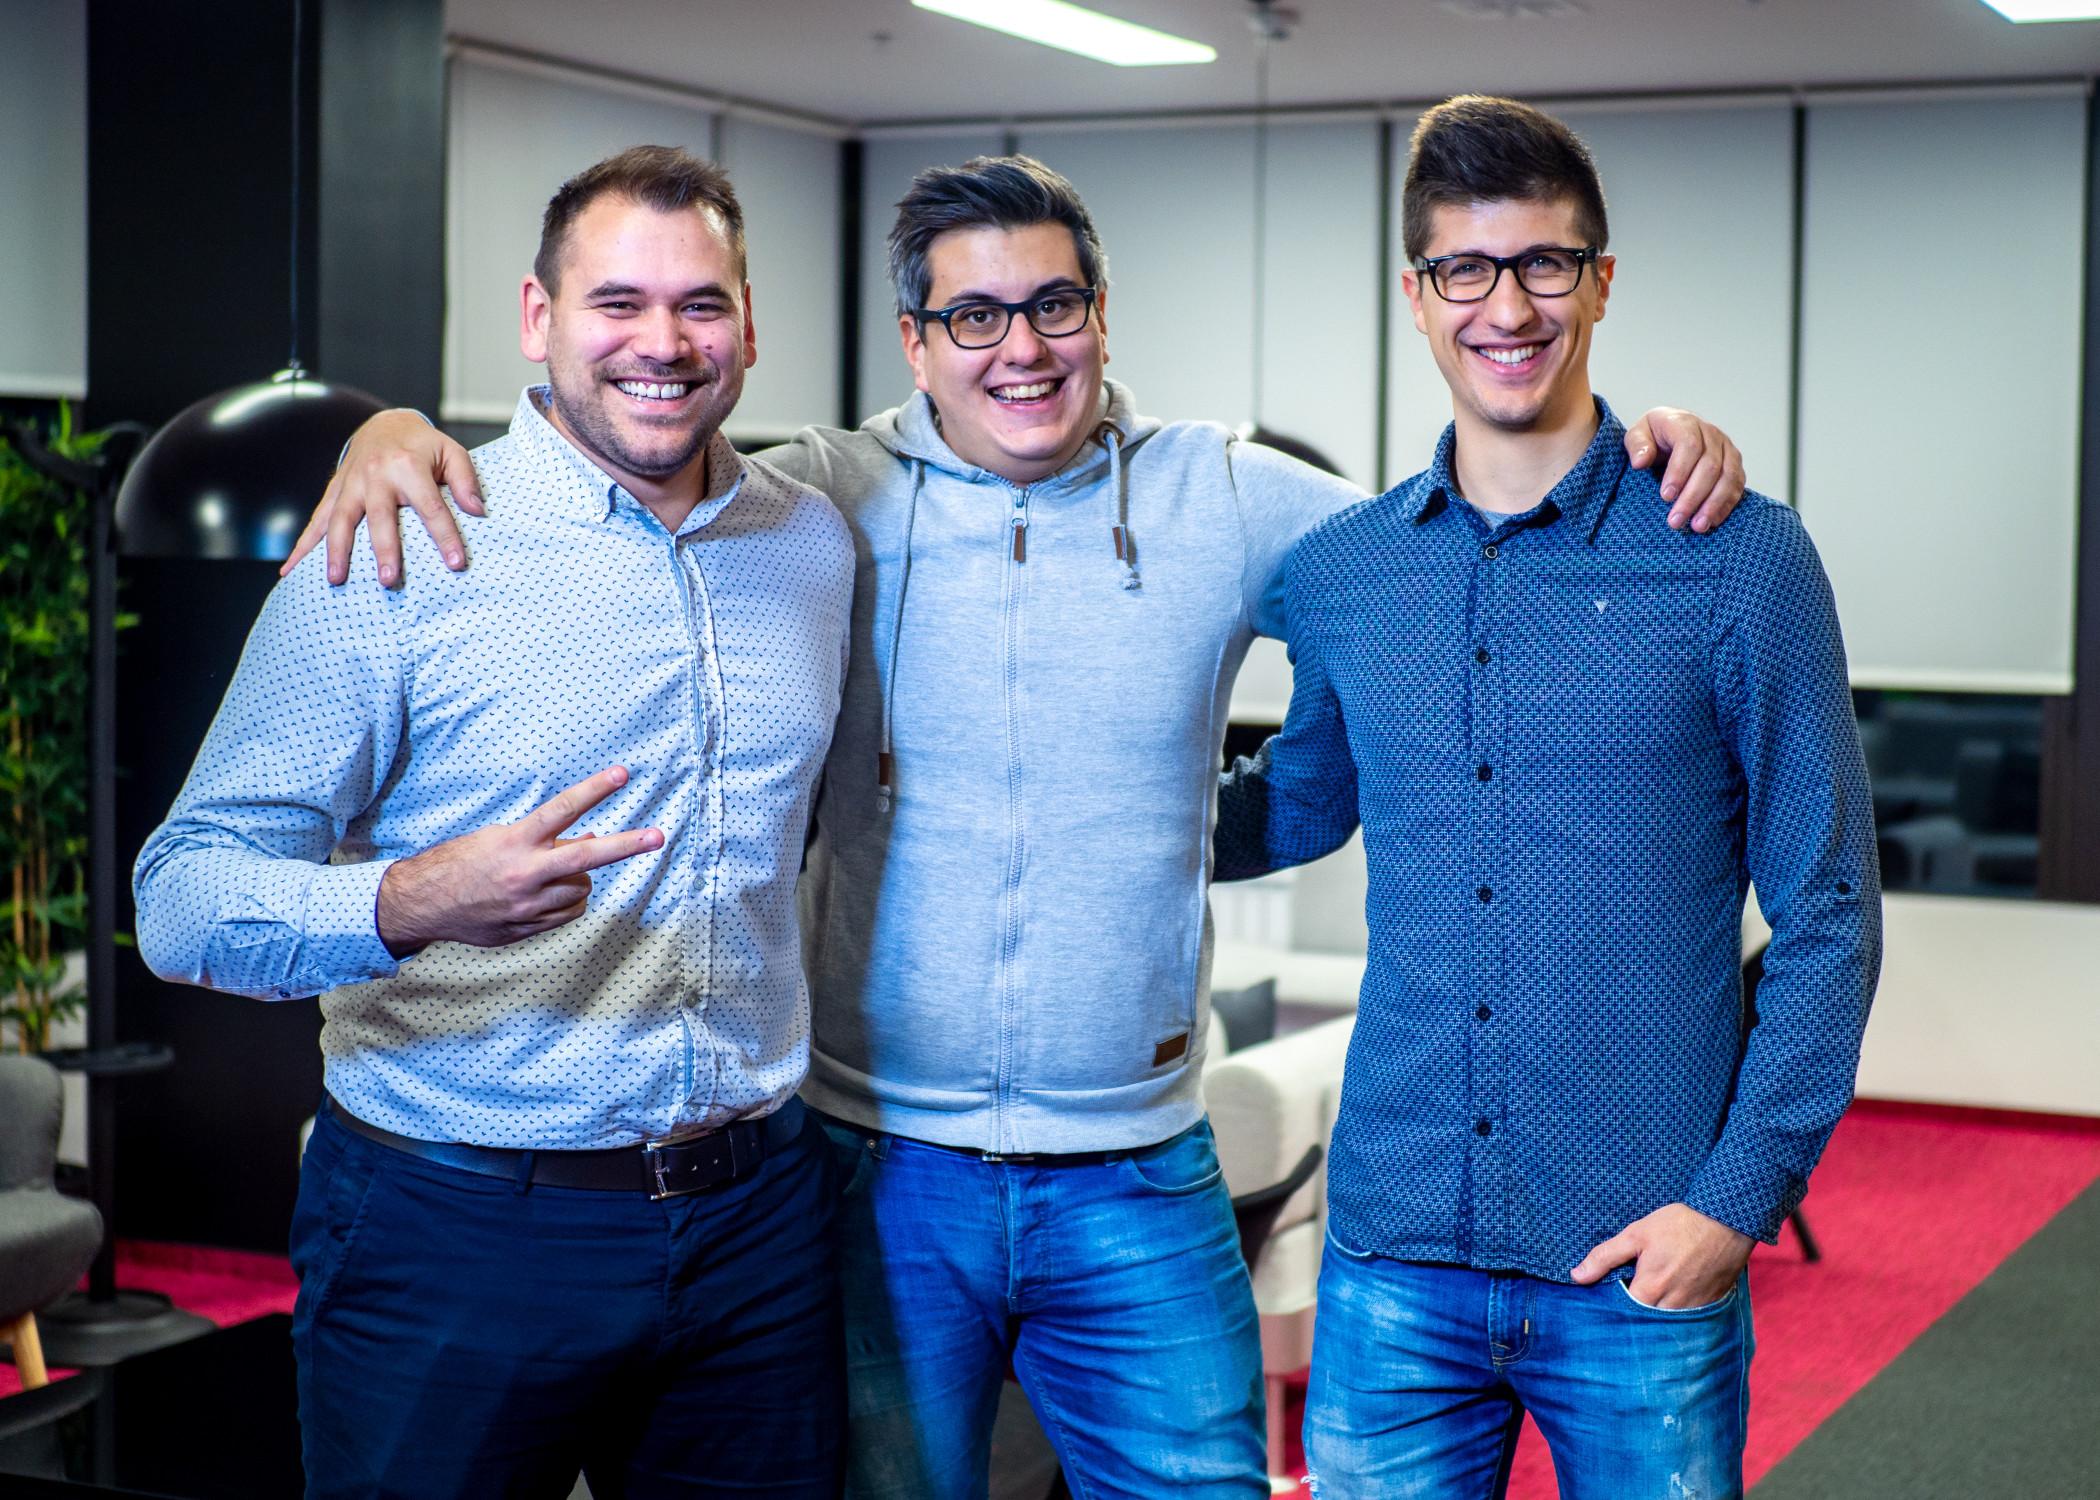 Algebra Lab Ding Startup teams